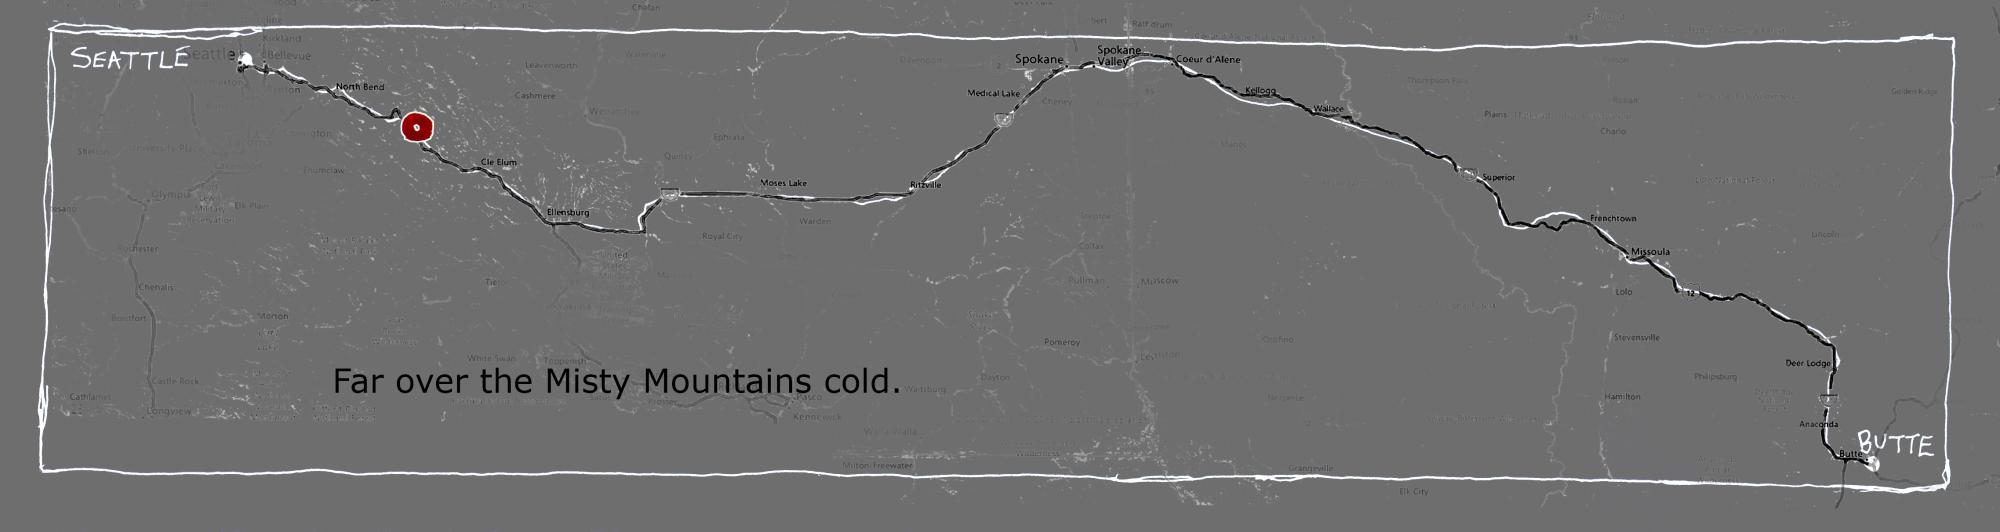 20 map grey